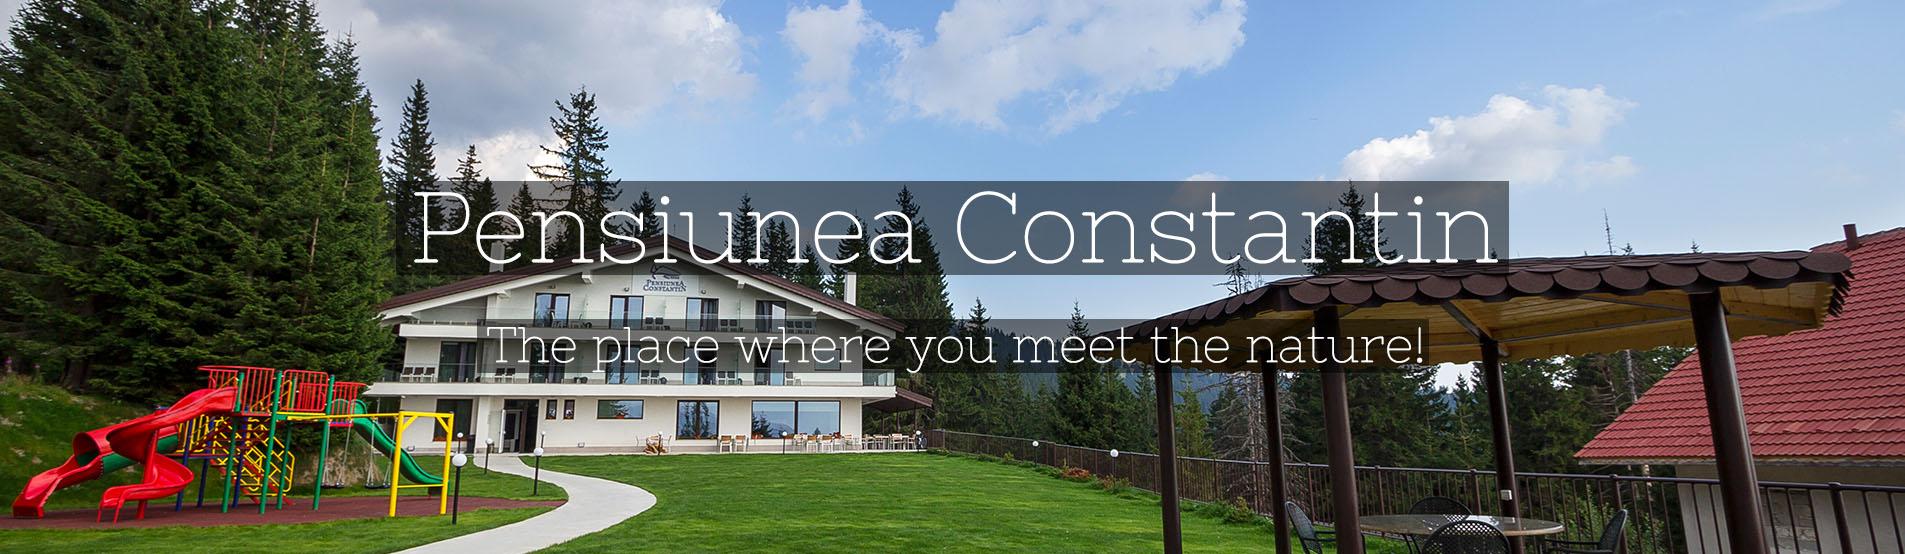 Pensiunea Constantin - Accommodation in Ranca